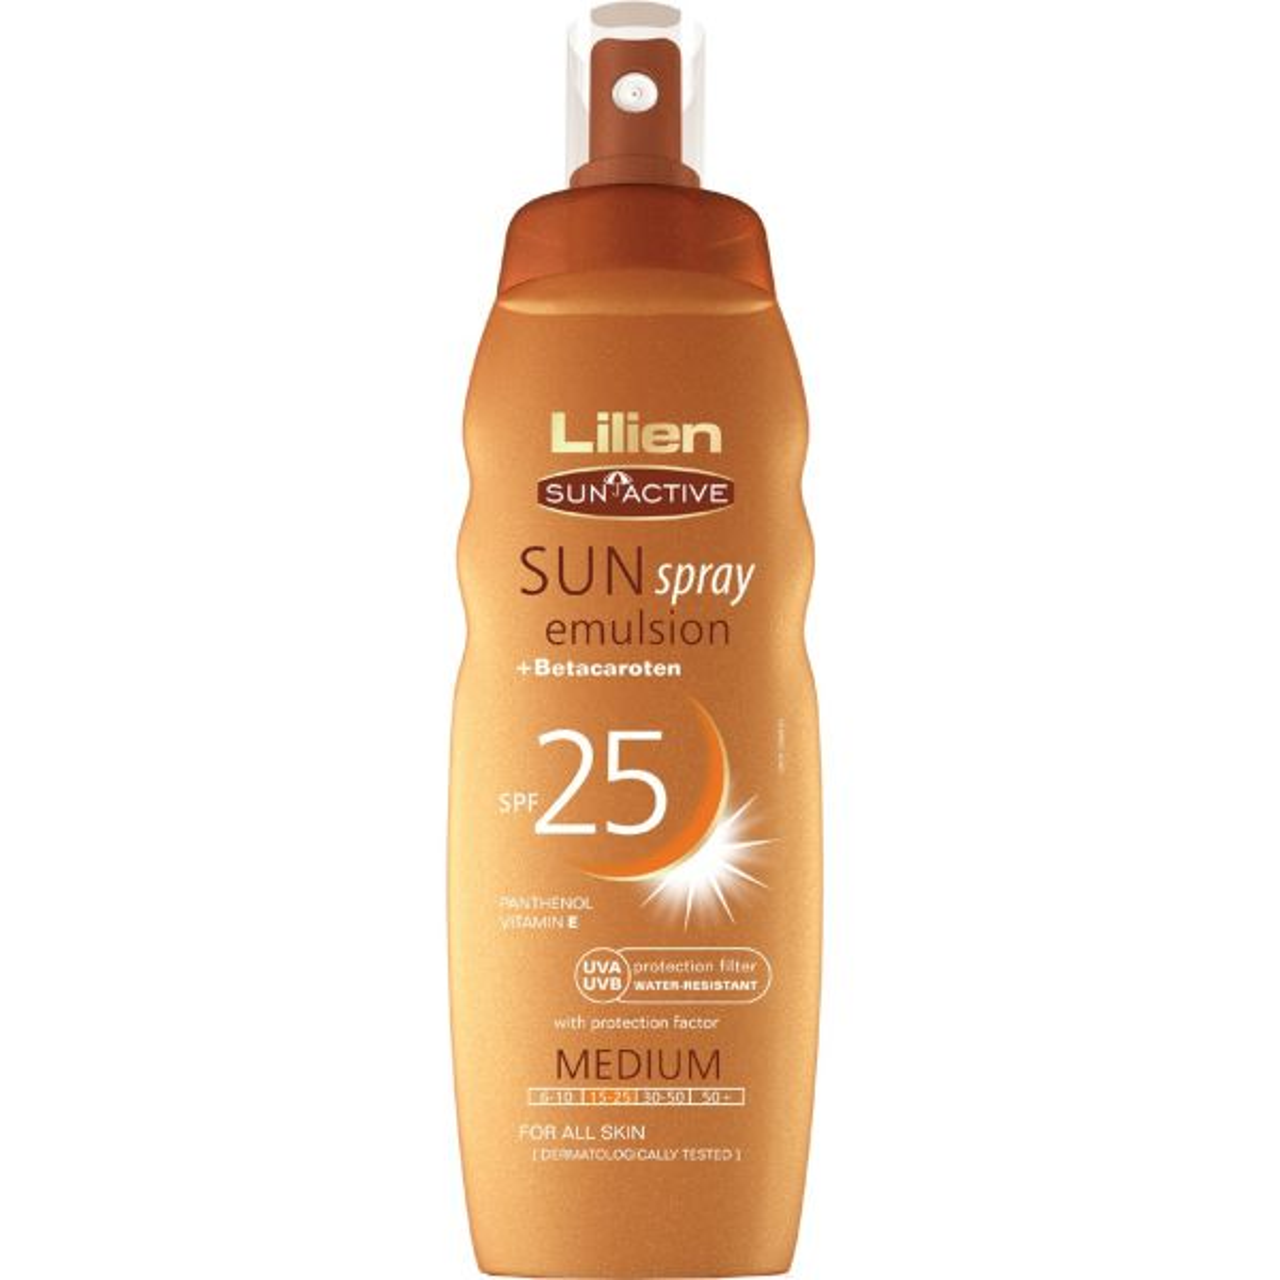 اسپری آفتاب لیلین سان اکتیو مدل Sun Spray With Betacaroten با SPF25 حجم 200 میلی لیتر